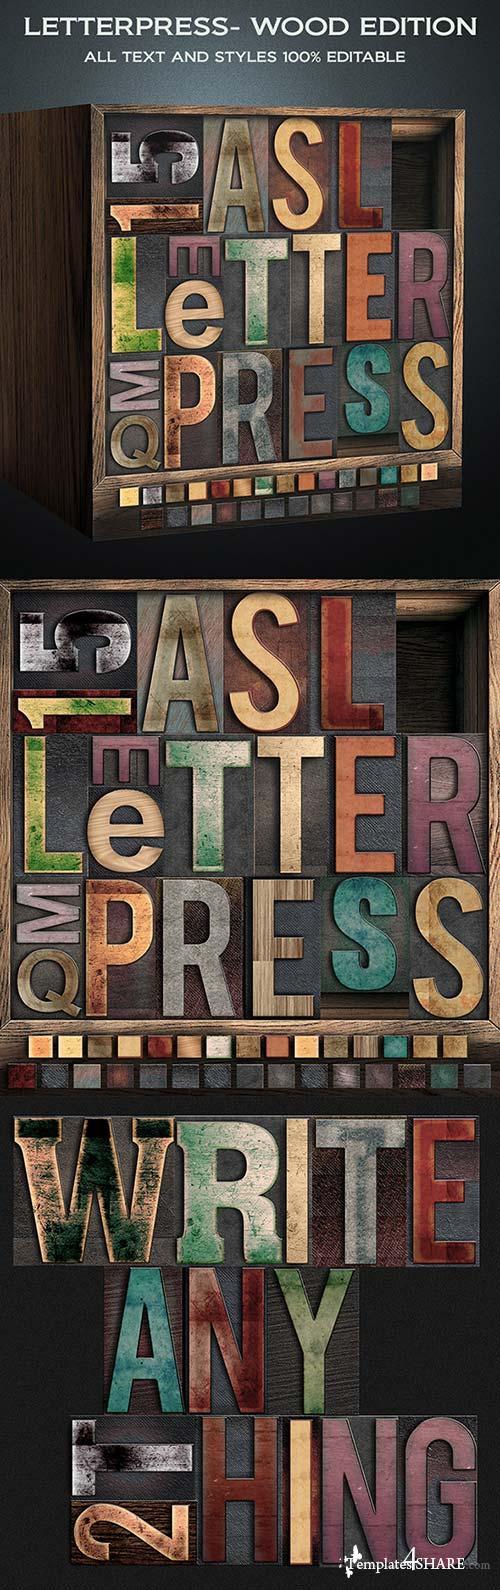 GraphicRiver Letterpress - Wood Edition